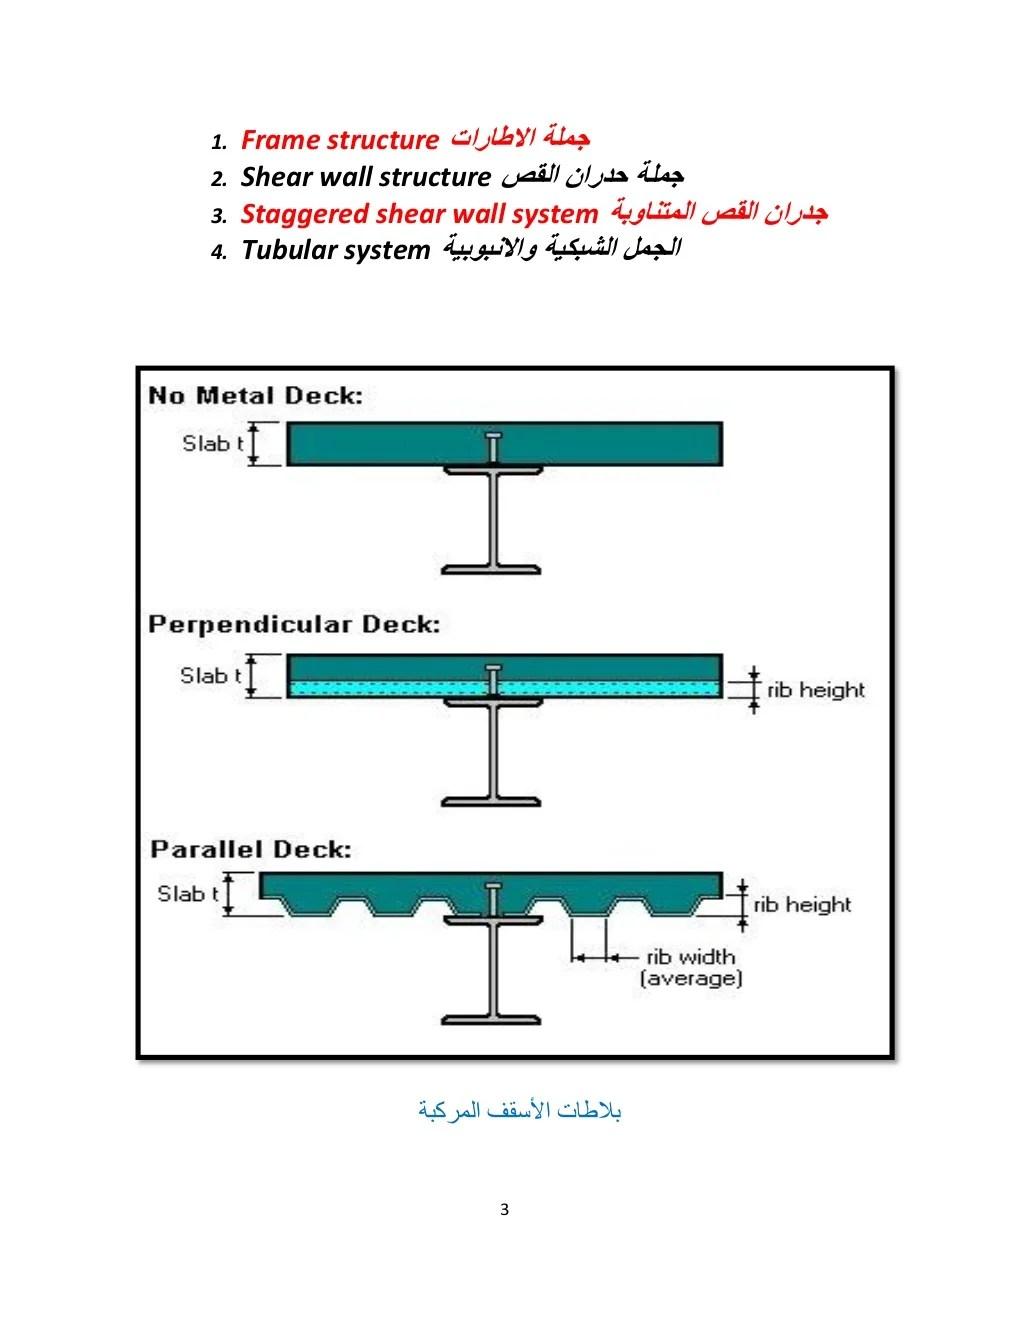 seismic-design-of-composite-shear-walls-frames-3-1024.jpg